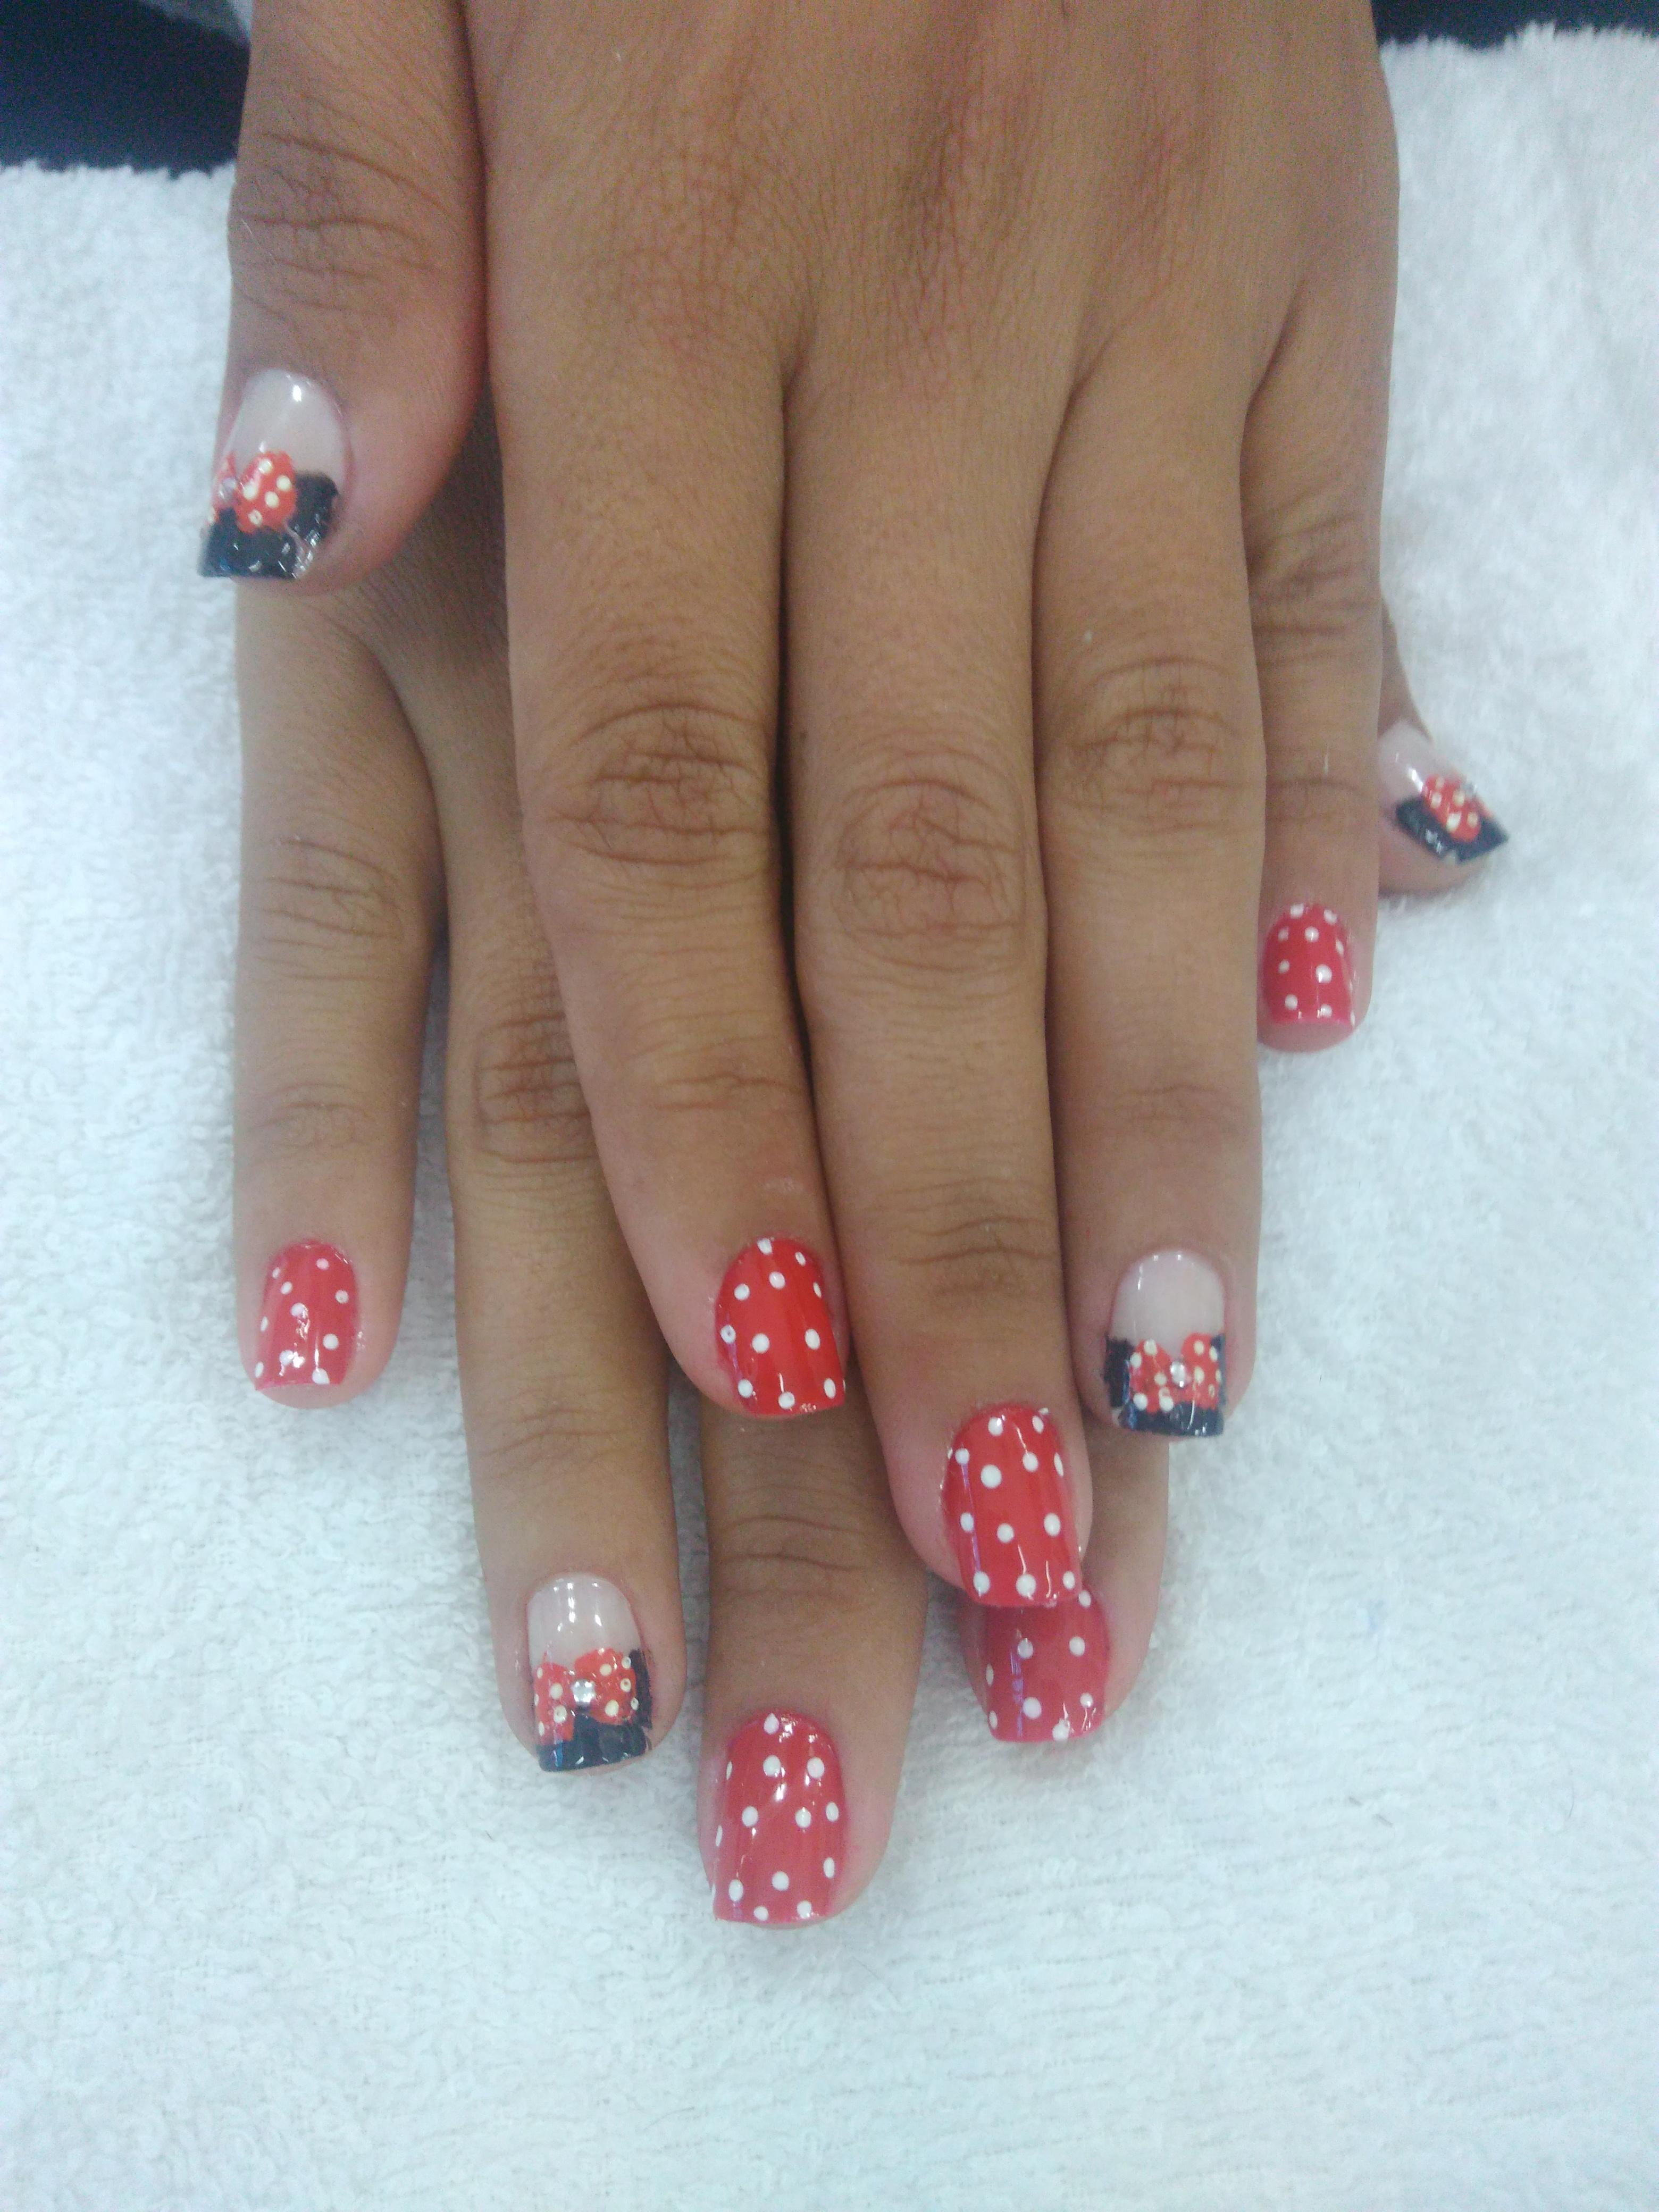 Mini💕 auxiliar cabeleireiro(a) escovista manicure e pedicure